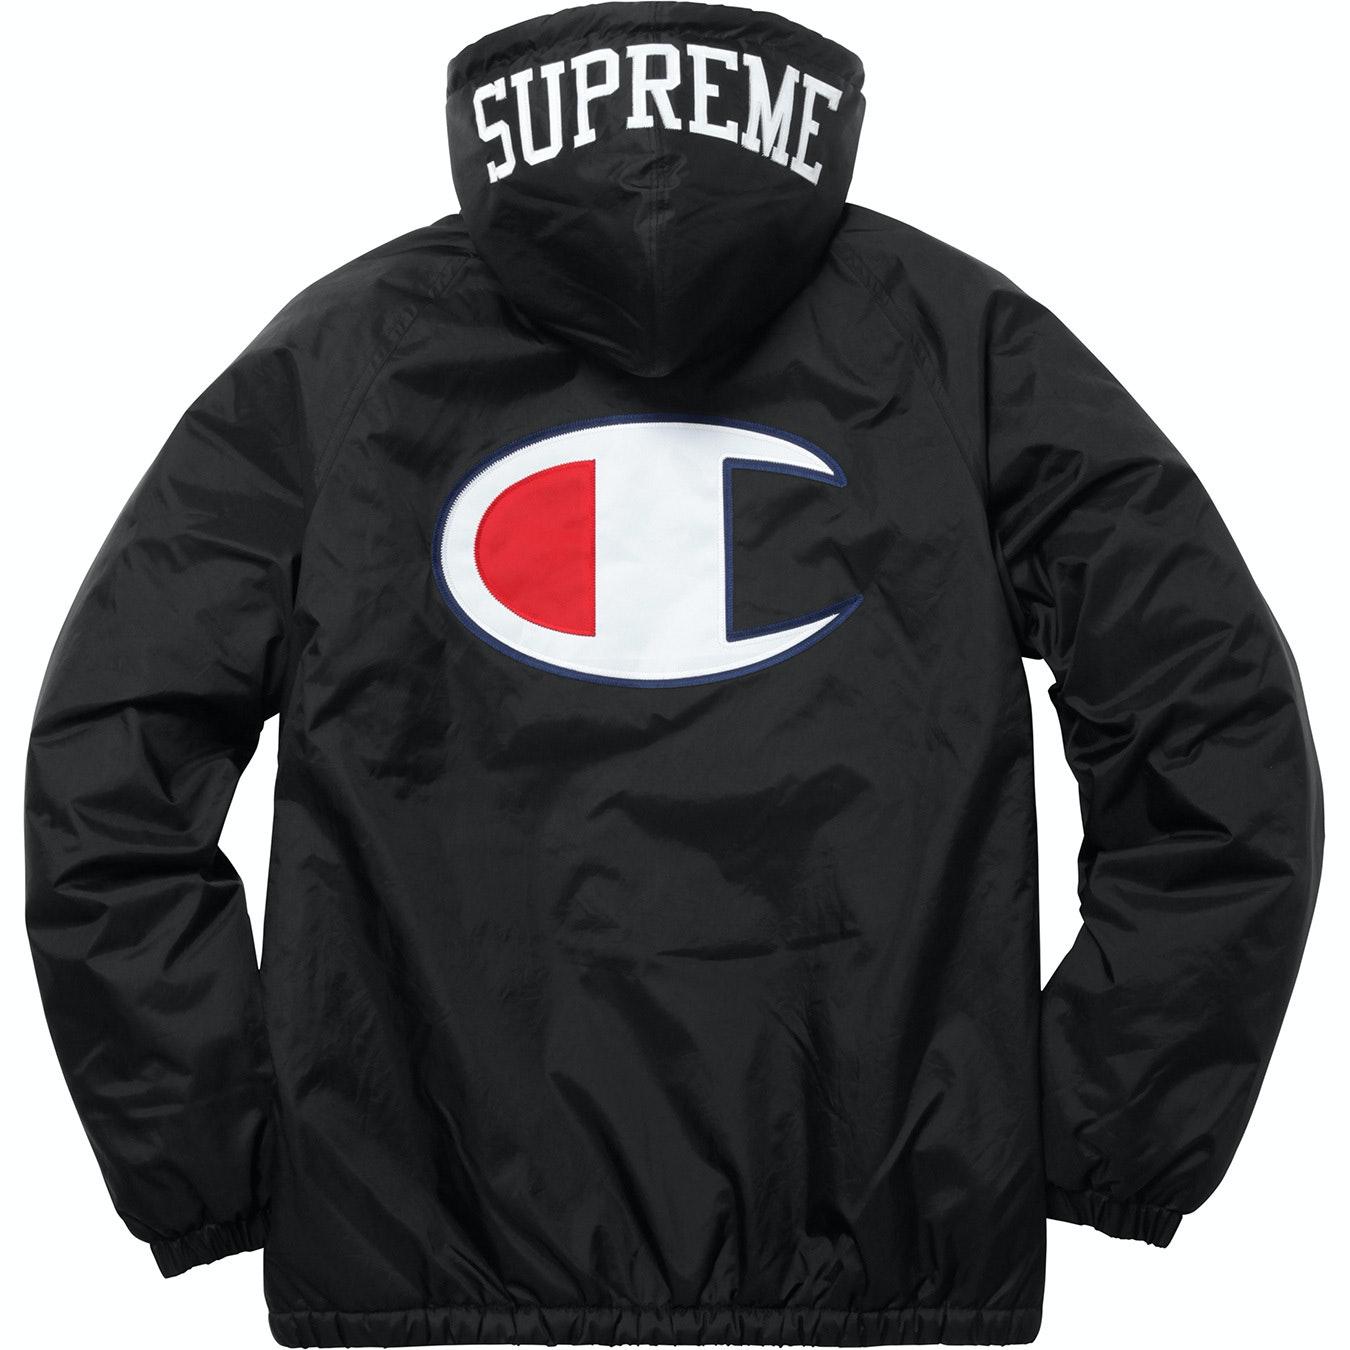 Supreme Champion Sherpa Lined Hooded Jacket Black